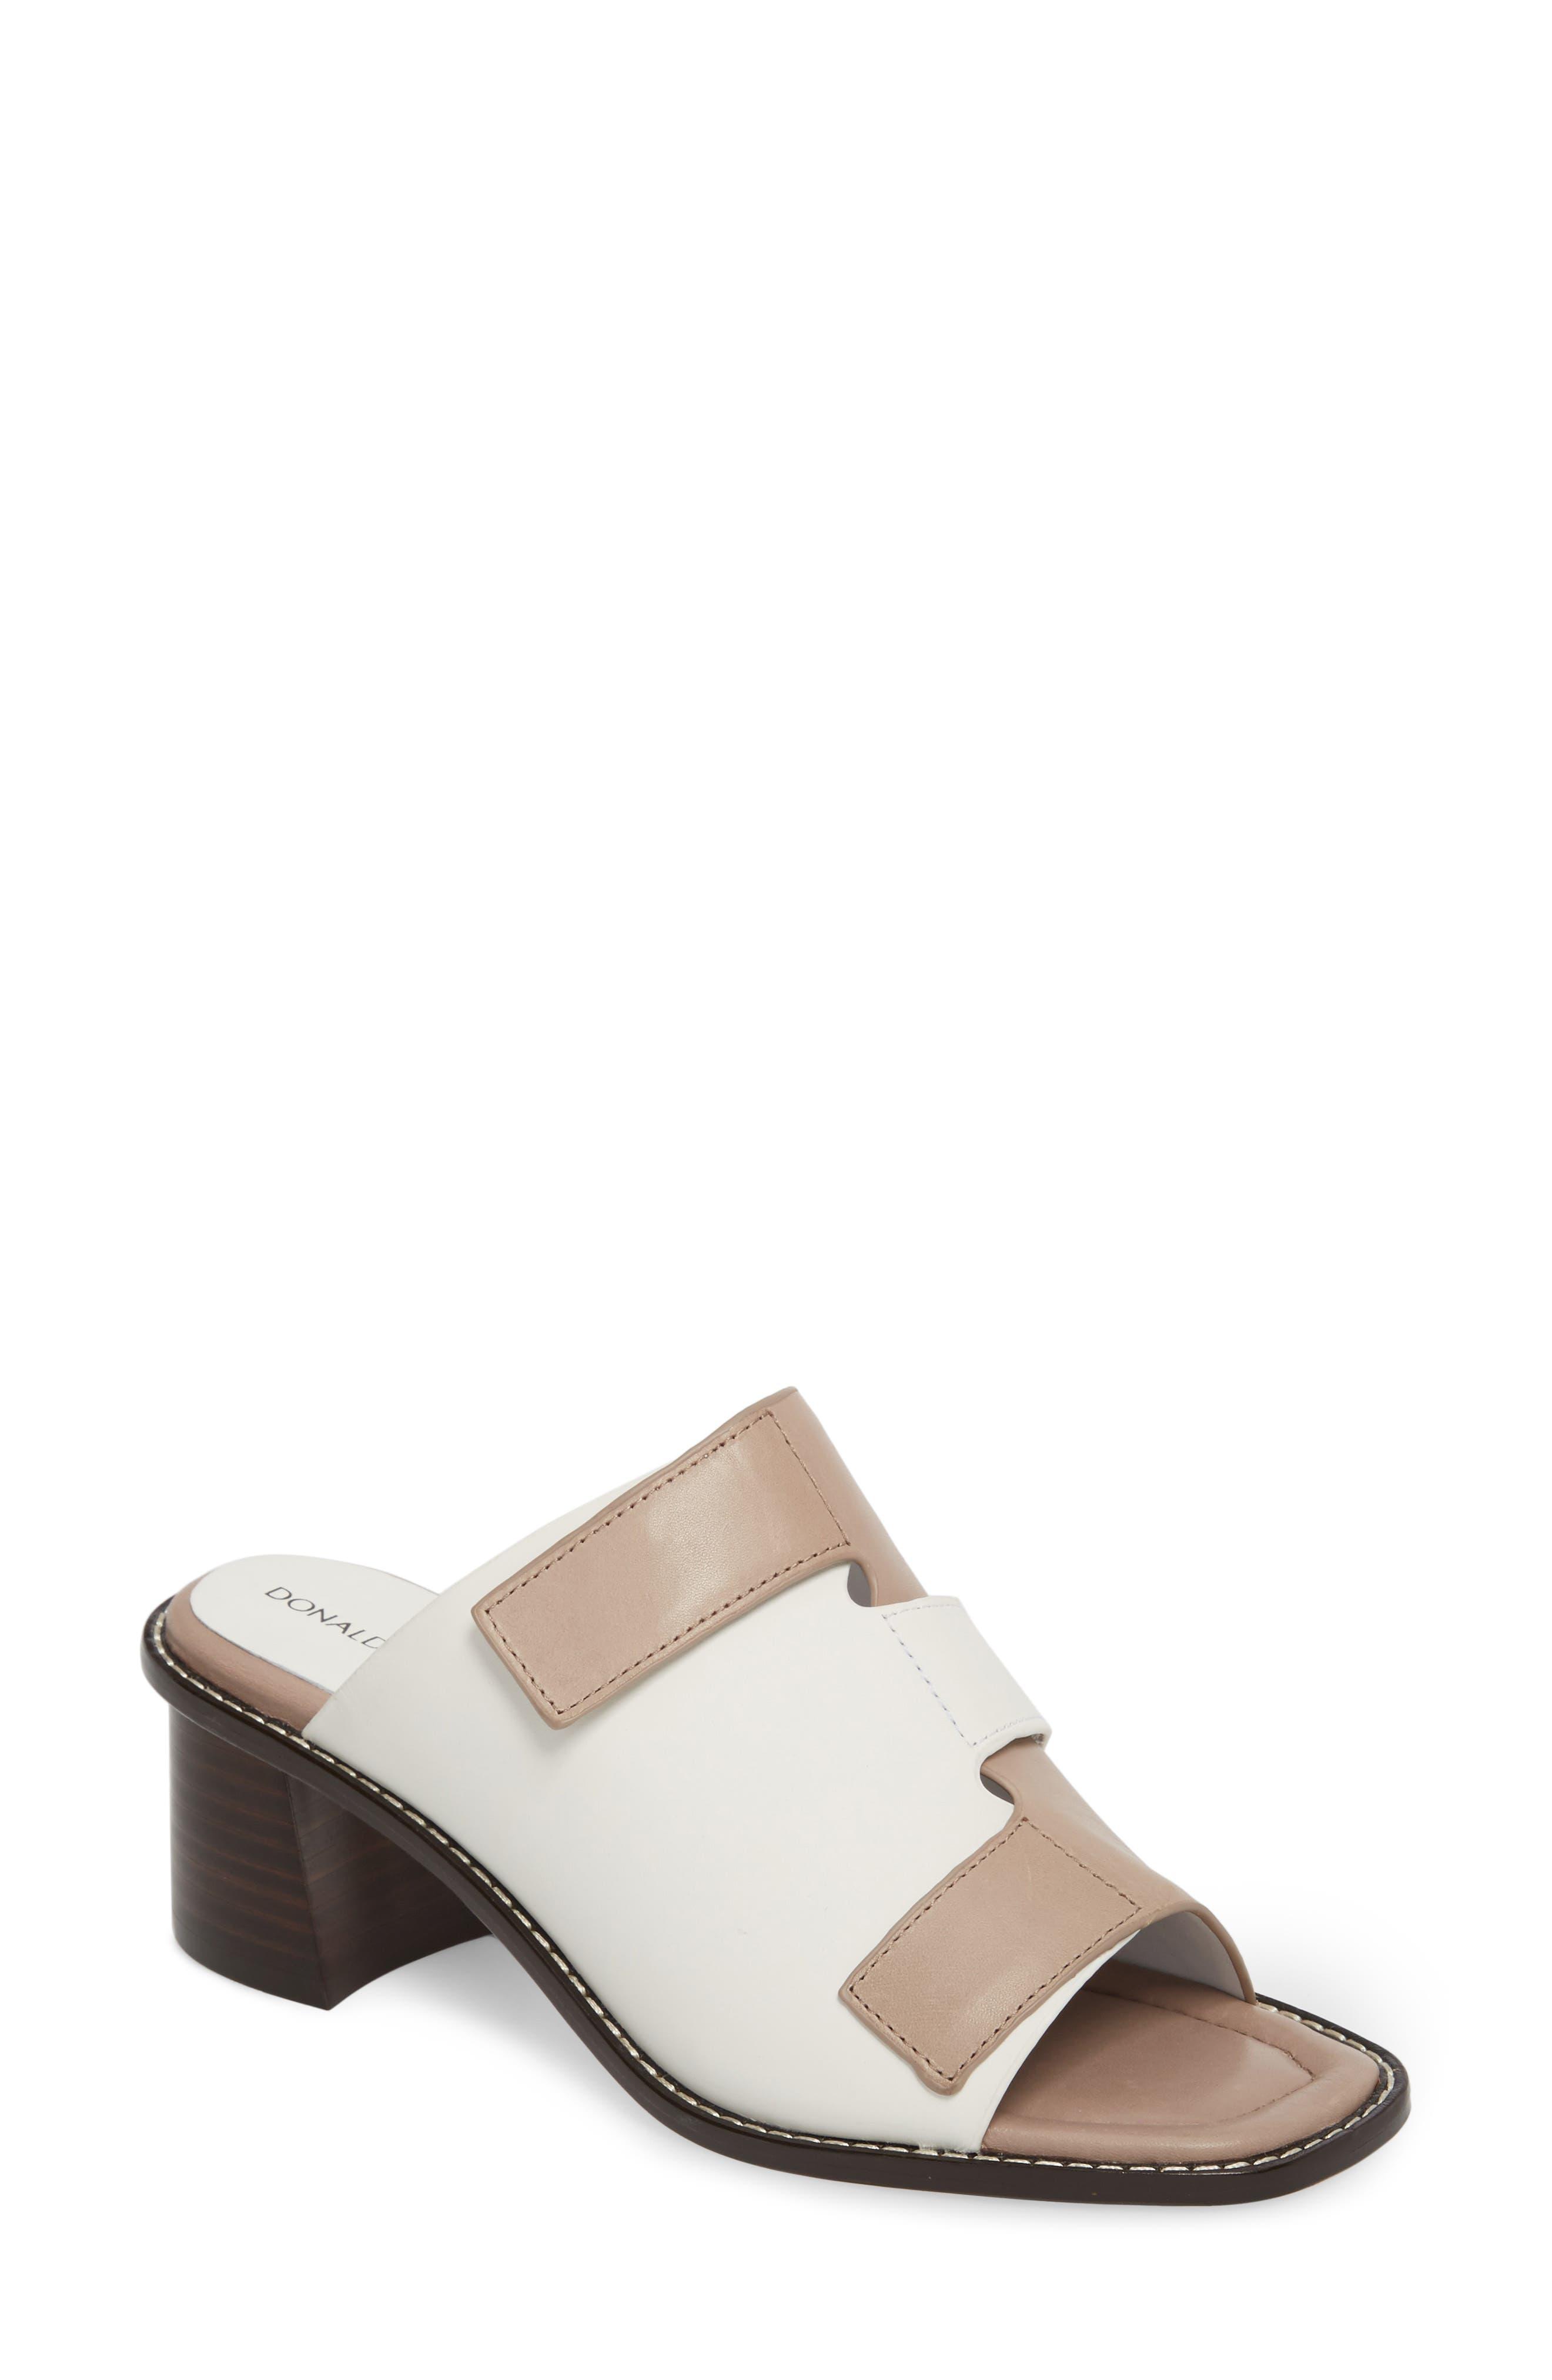 Amalia Block Heel Sandal,                         Main,                         color, Bone Leather